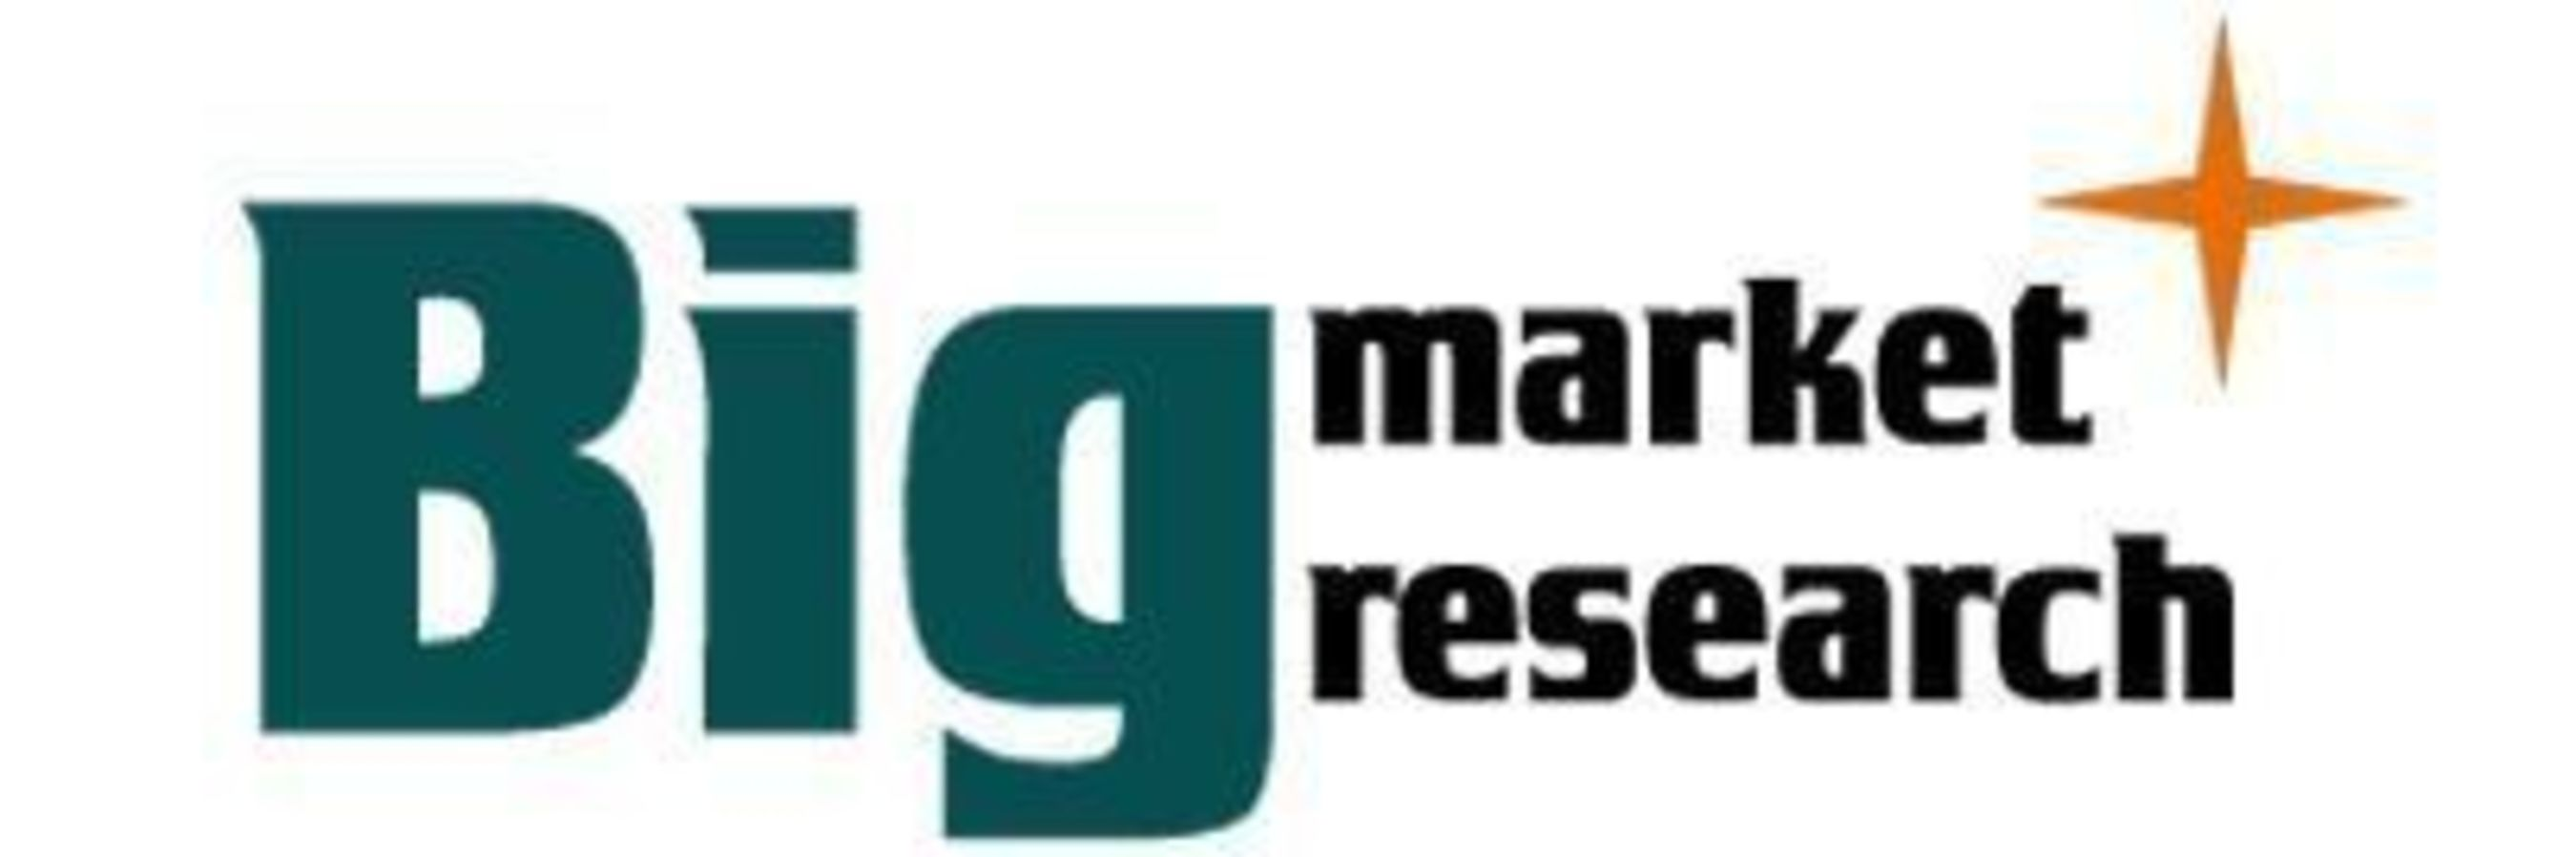 PR NEWSWIRE INDIA- Big Market research (PRNewsFoto/Big Market Research)